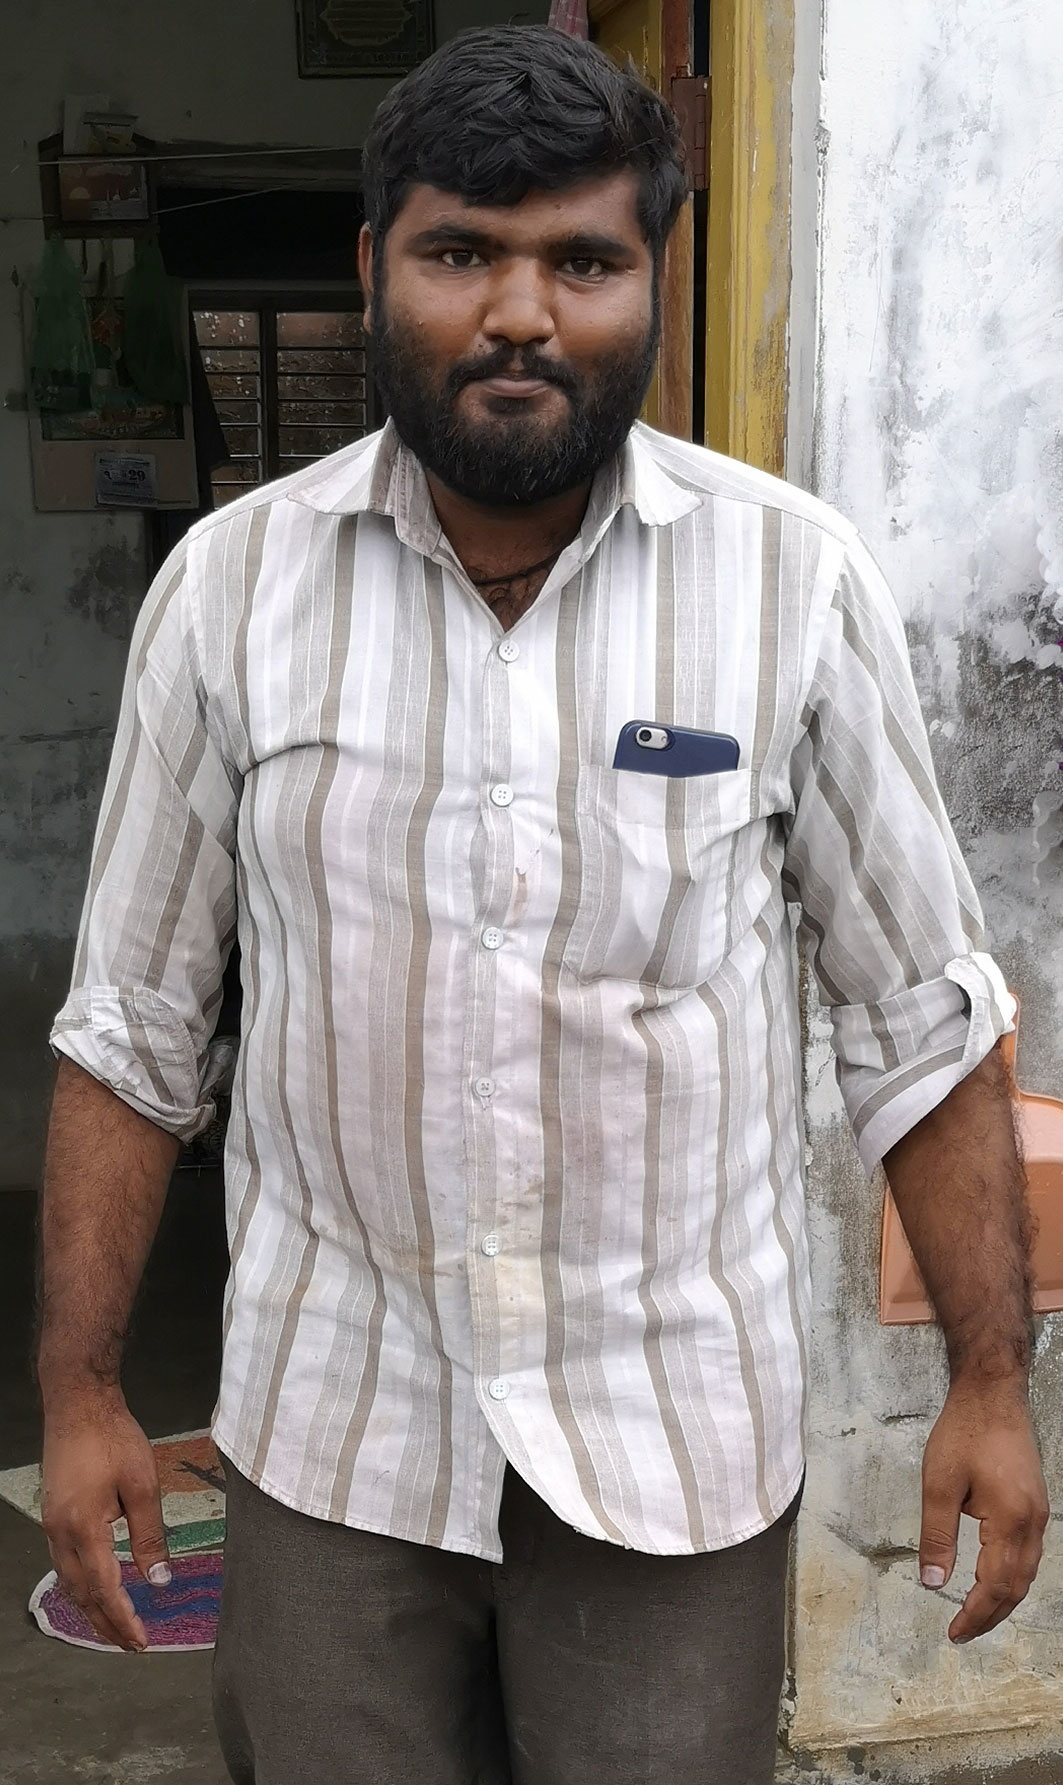 Khalid, maker van de sjaals